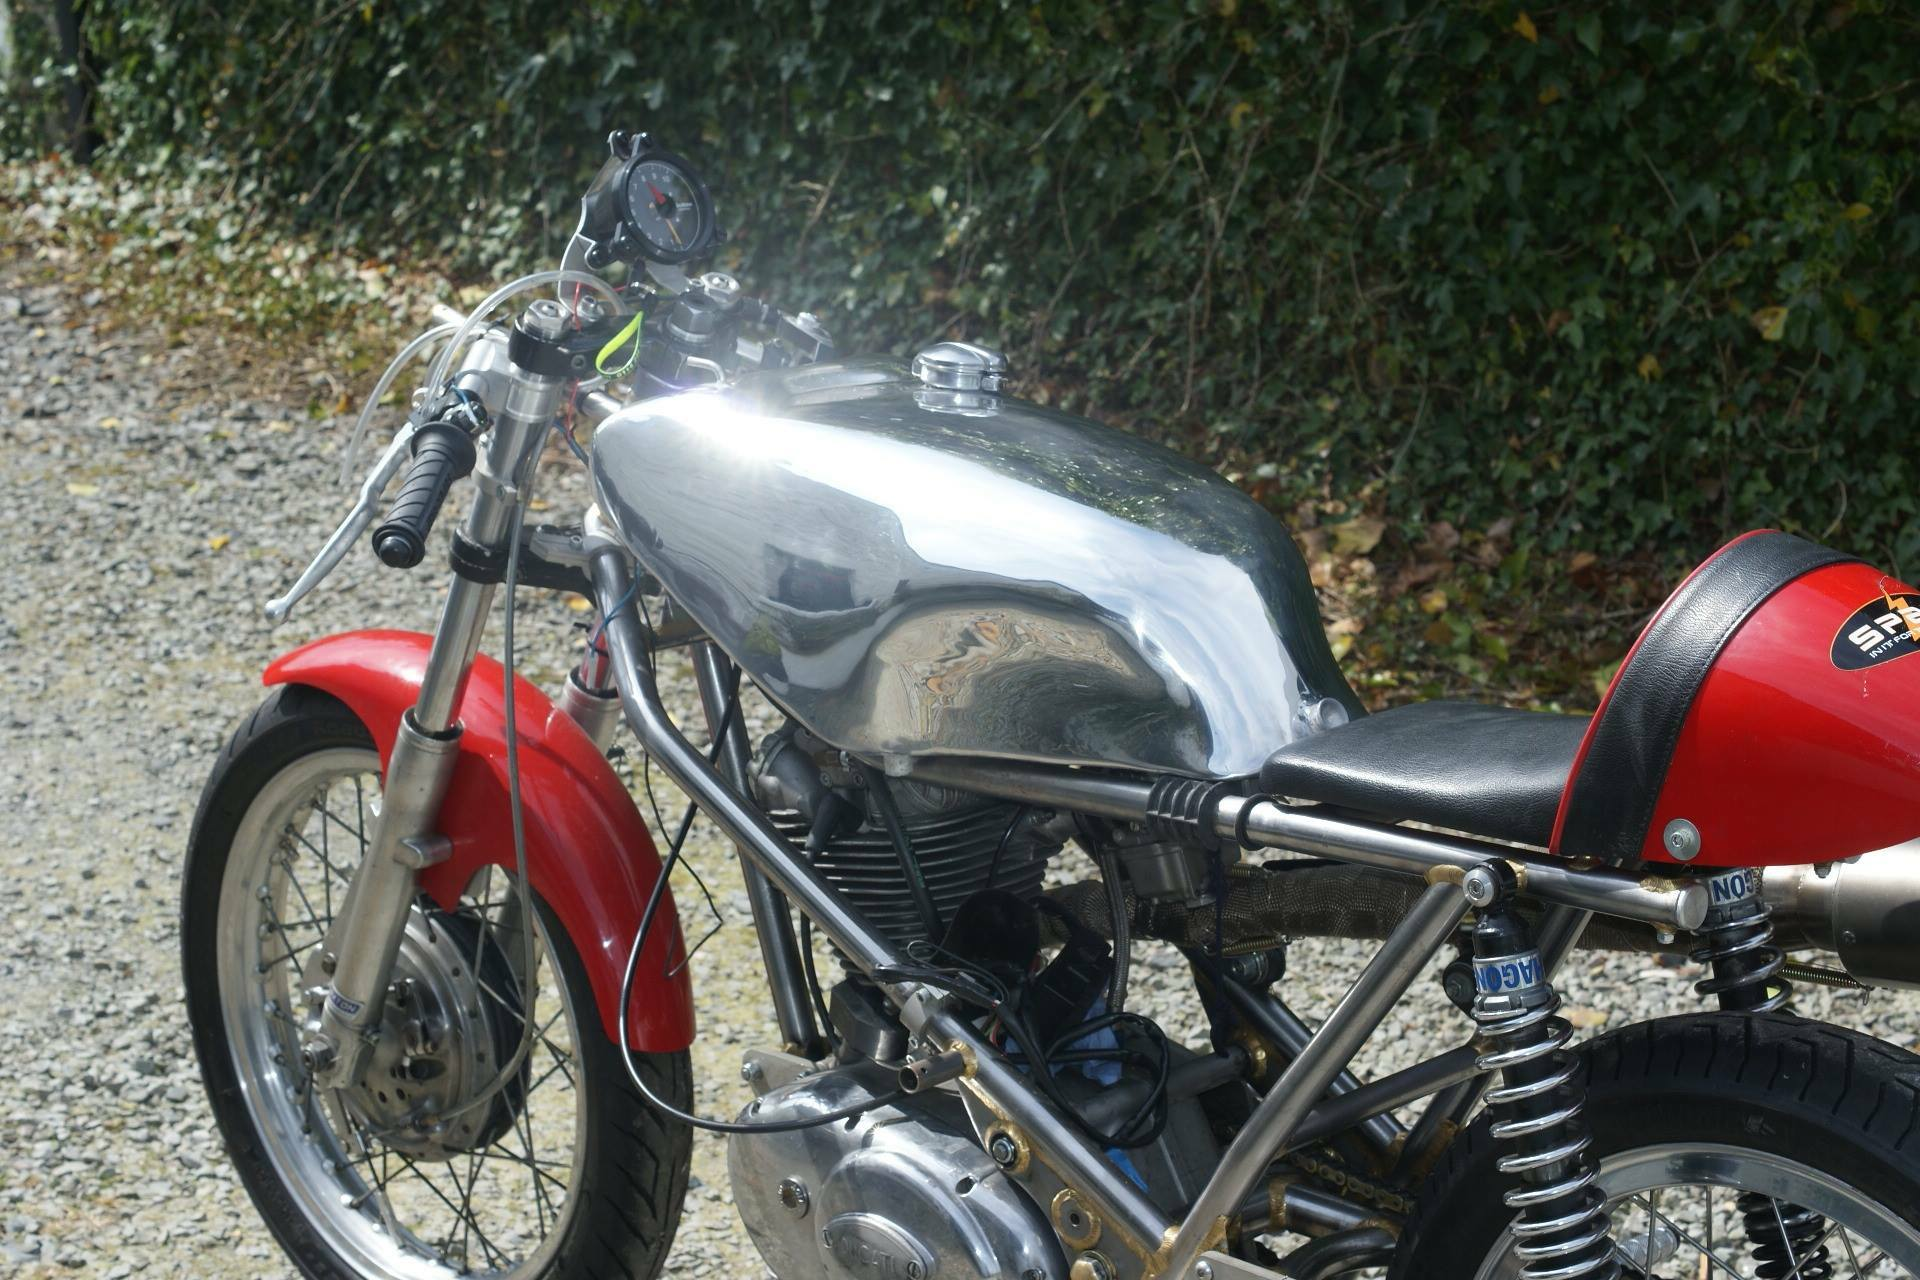 Seeley Ducati